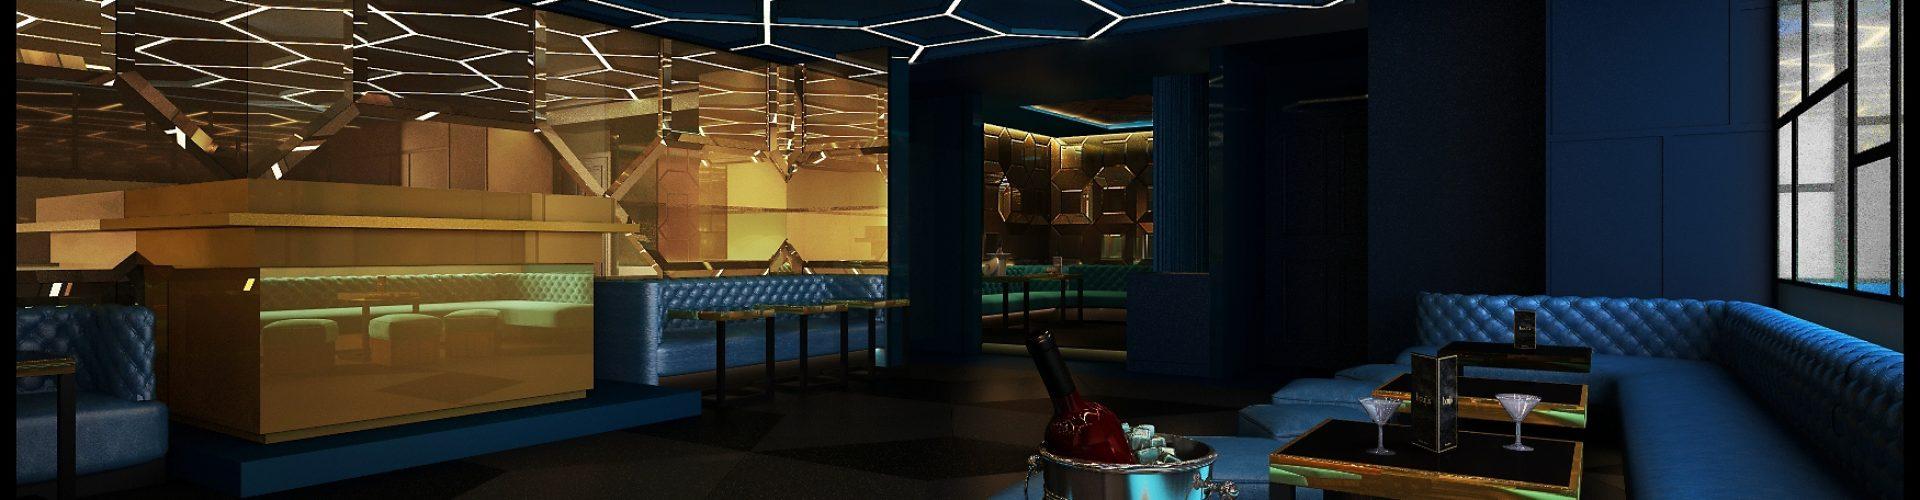 interesting-nightclub-interior-inpirations-with-unique-ceiling-light-and-blue-concept-also-table-sets-o69nrnkh34mzrnwv167wl42e9ukgljwbg7j1cwbp1k